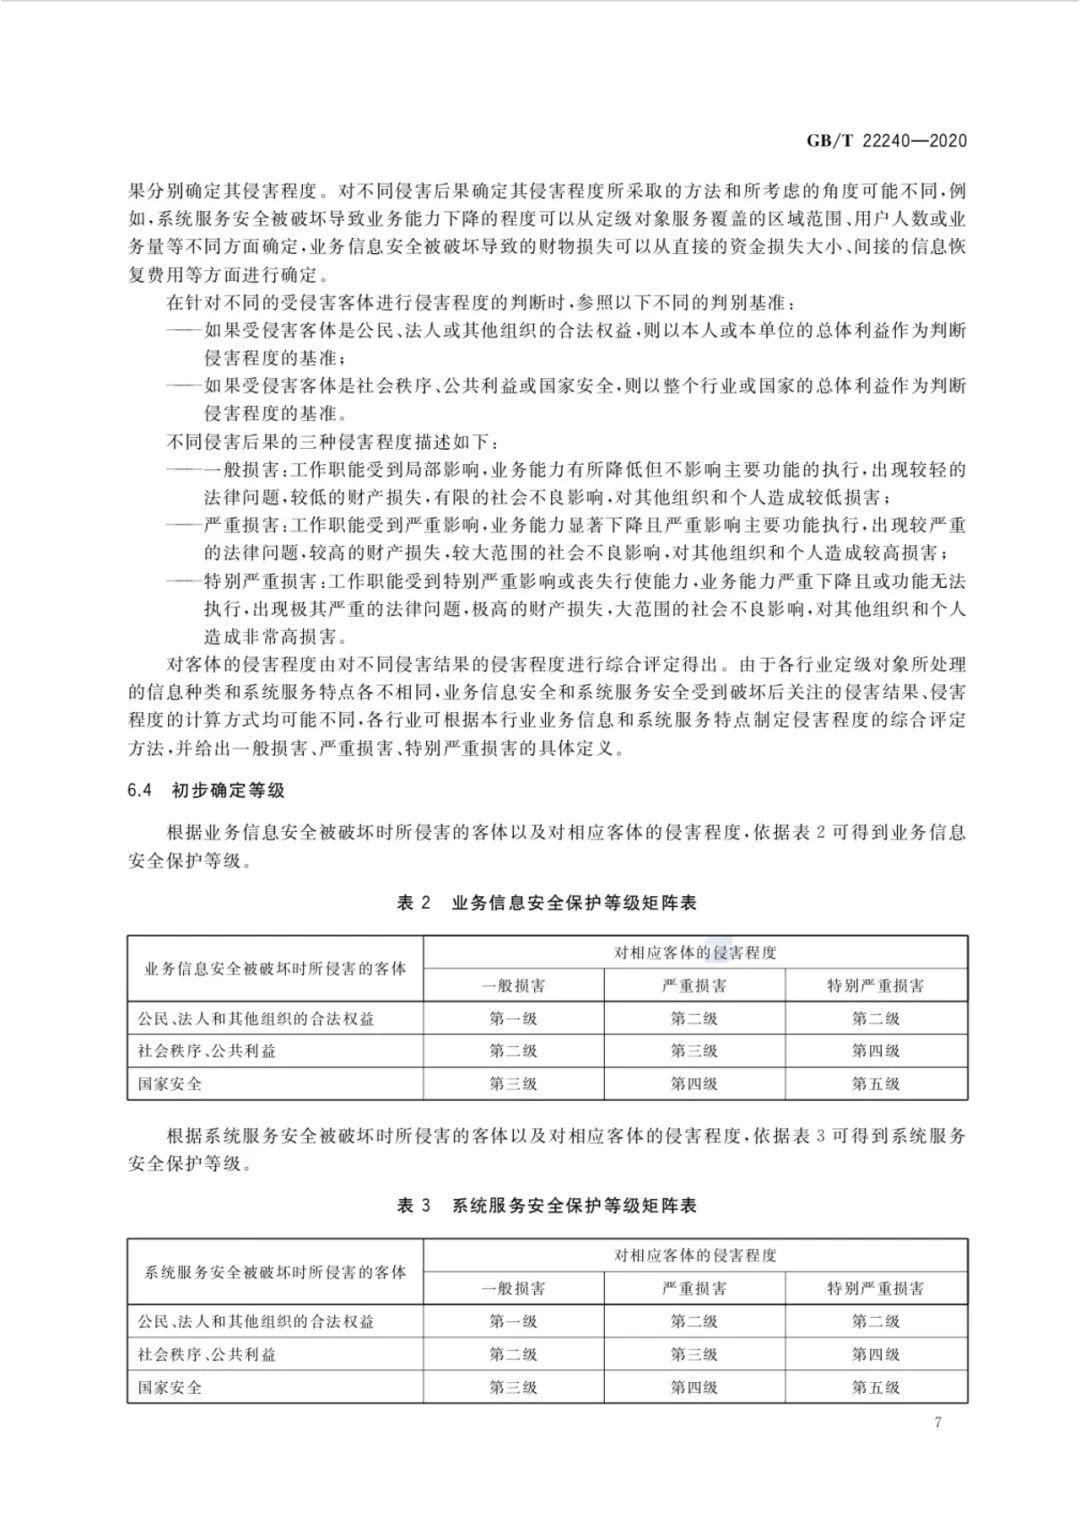 f6d3f13c714968812492cbae5489b5b0.png